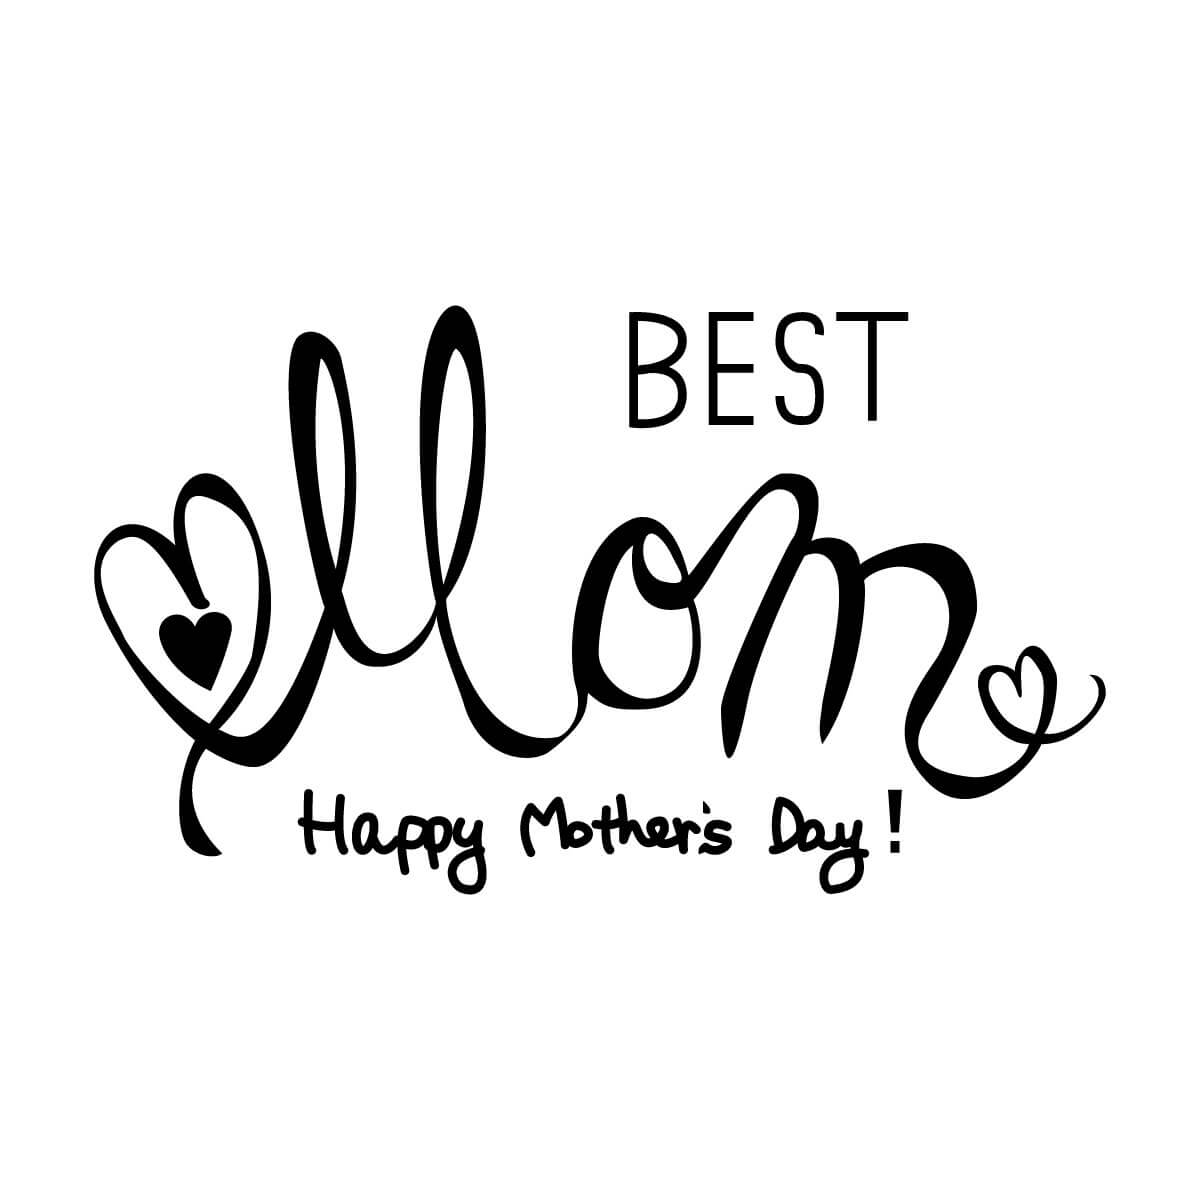 Best Mom2